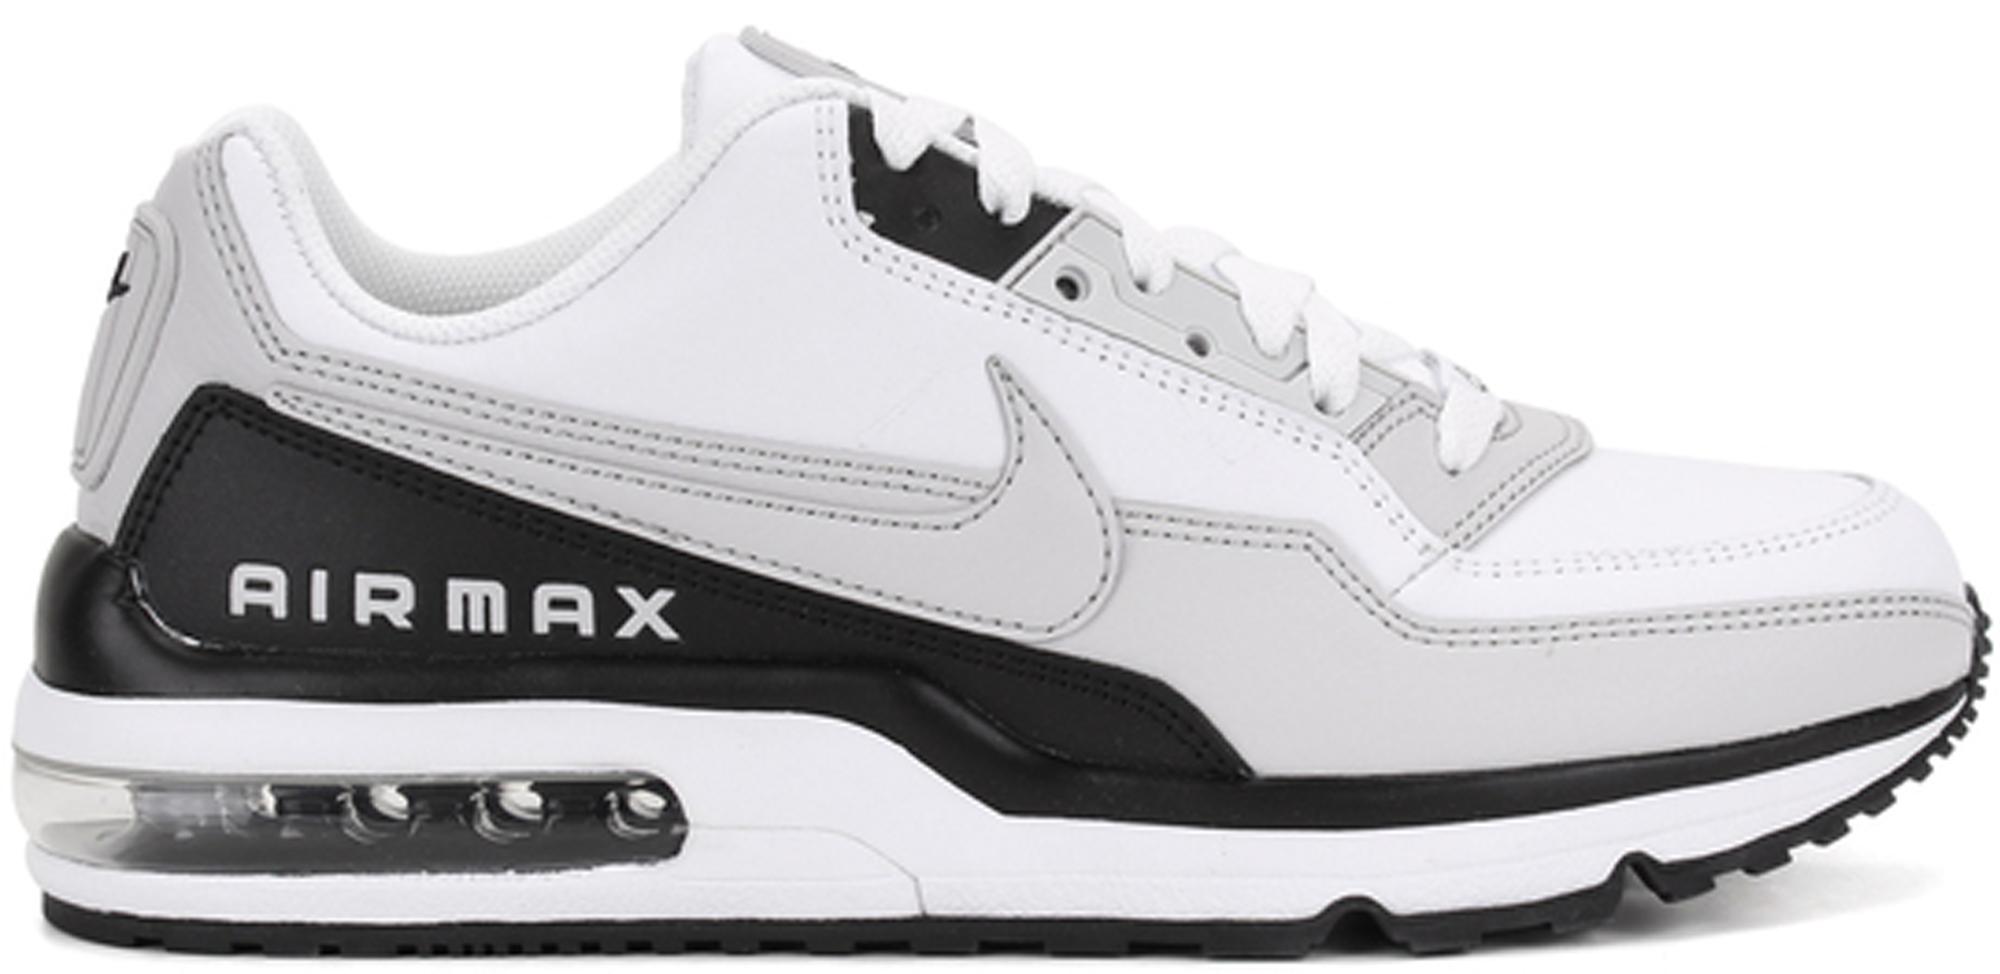 nike air max ltd 3 white and black